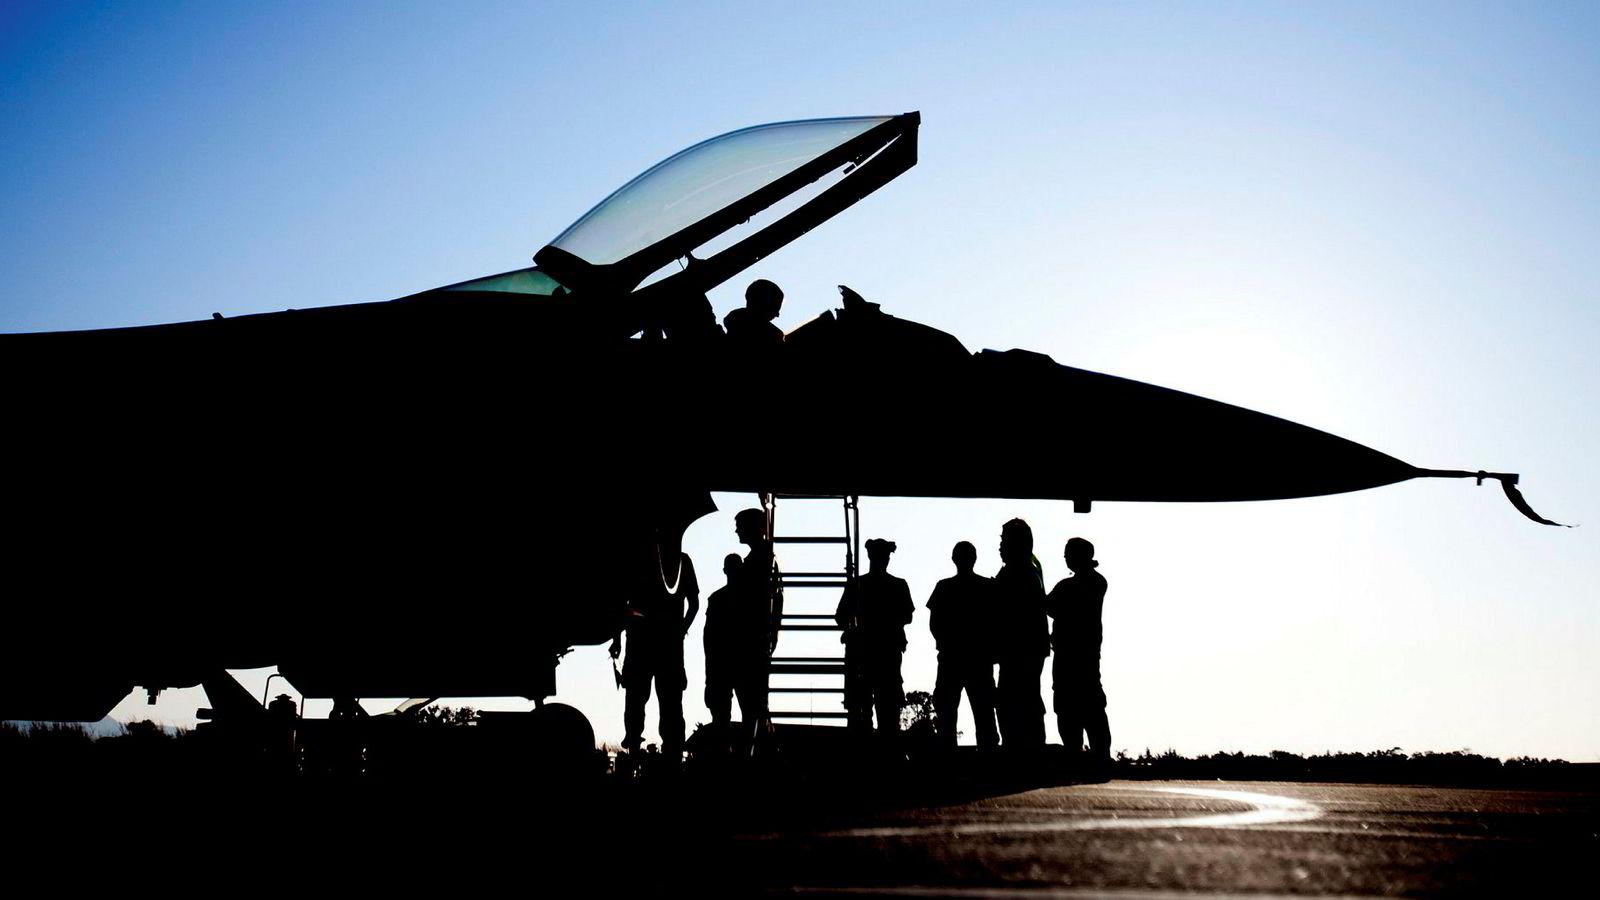 Regimeendring i Libya var ikke en målsetning for norske myndigheter. Norge var likevel med på en militæroperasjon som var klart medvirkende til at regimet falt. Her et jagerfly på Souda Air Base på Kreta etter deltagelse i Libya.